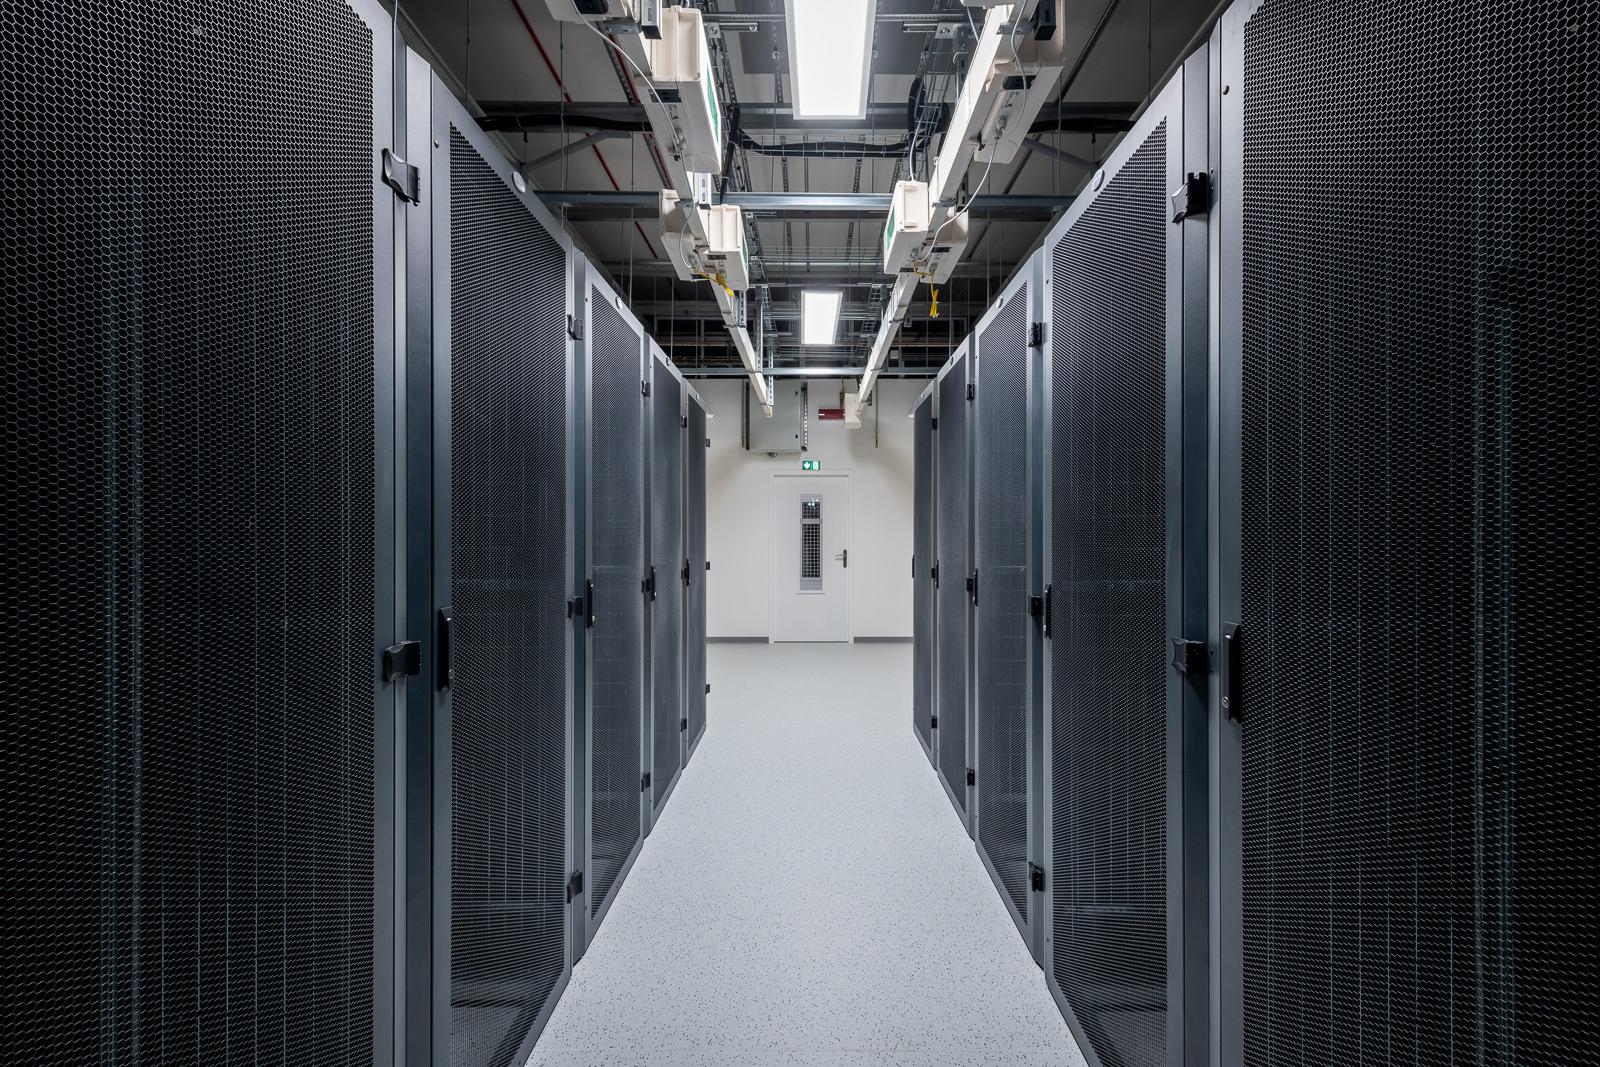 Visite Data Center DATA 17, Datacenter écoresponsable certifié TIER IV